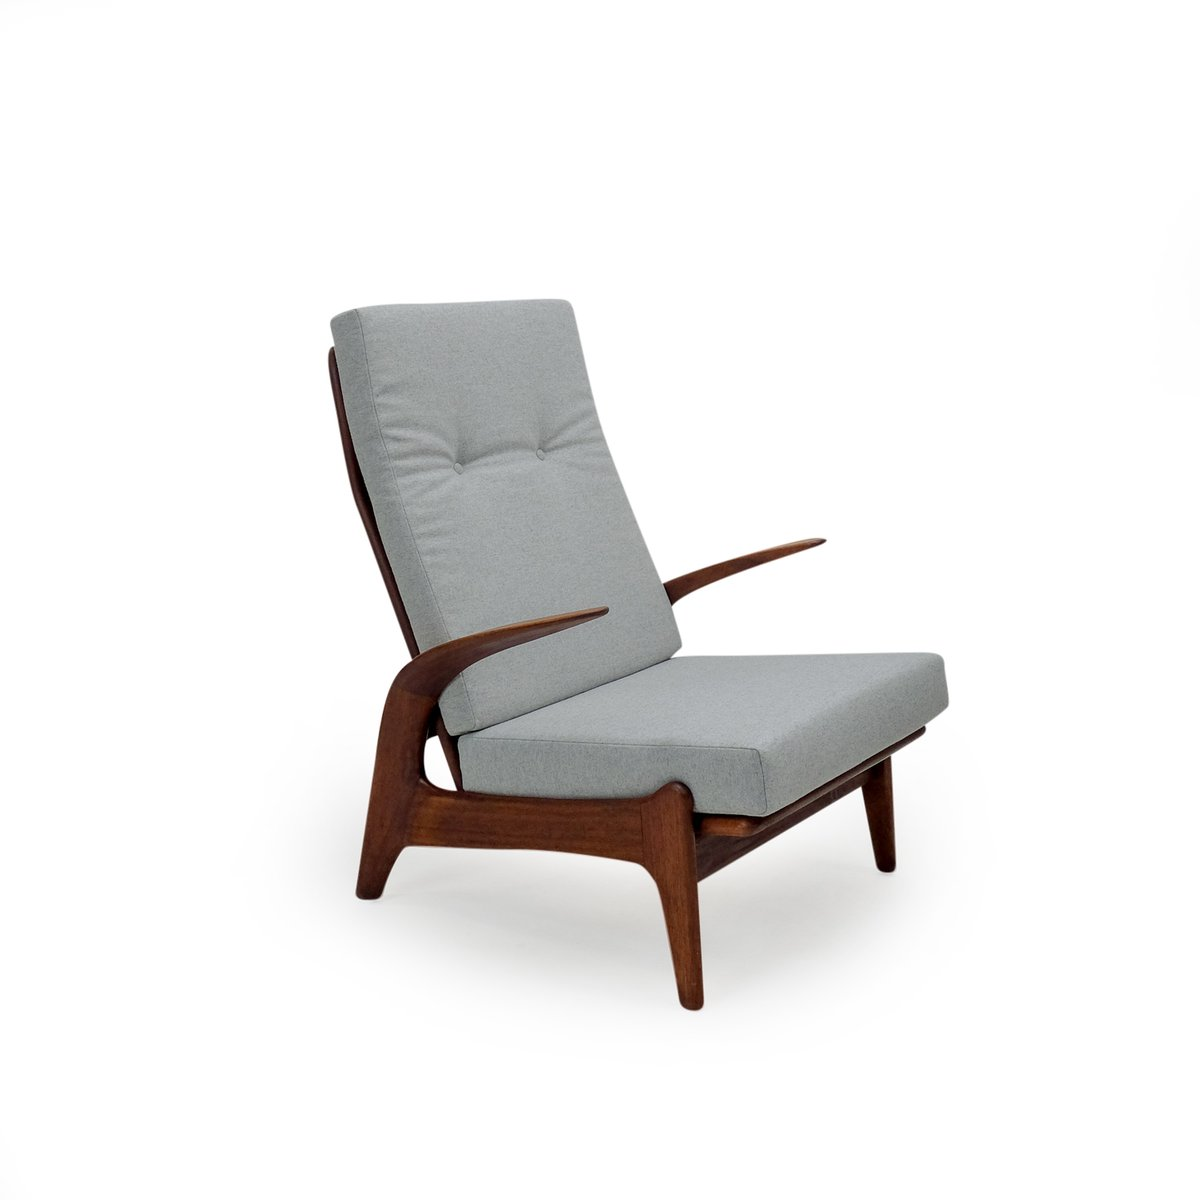 sessel mit hoher r ckenlehne von gimson slater f r de. Black Bedroom Furniture Sets. Home Design Ideas